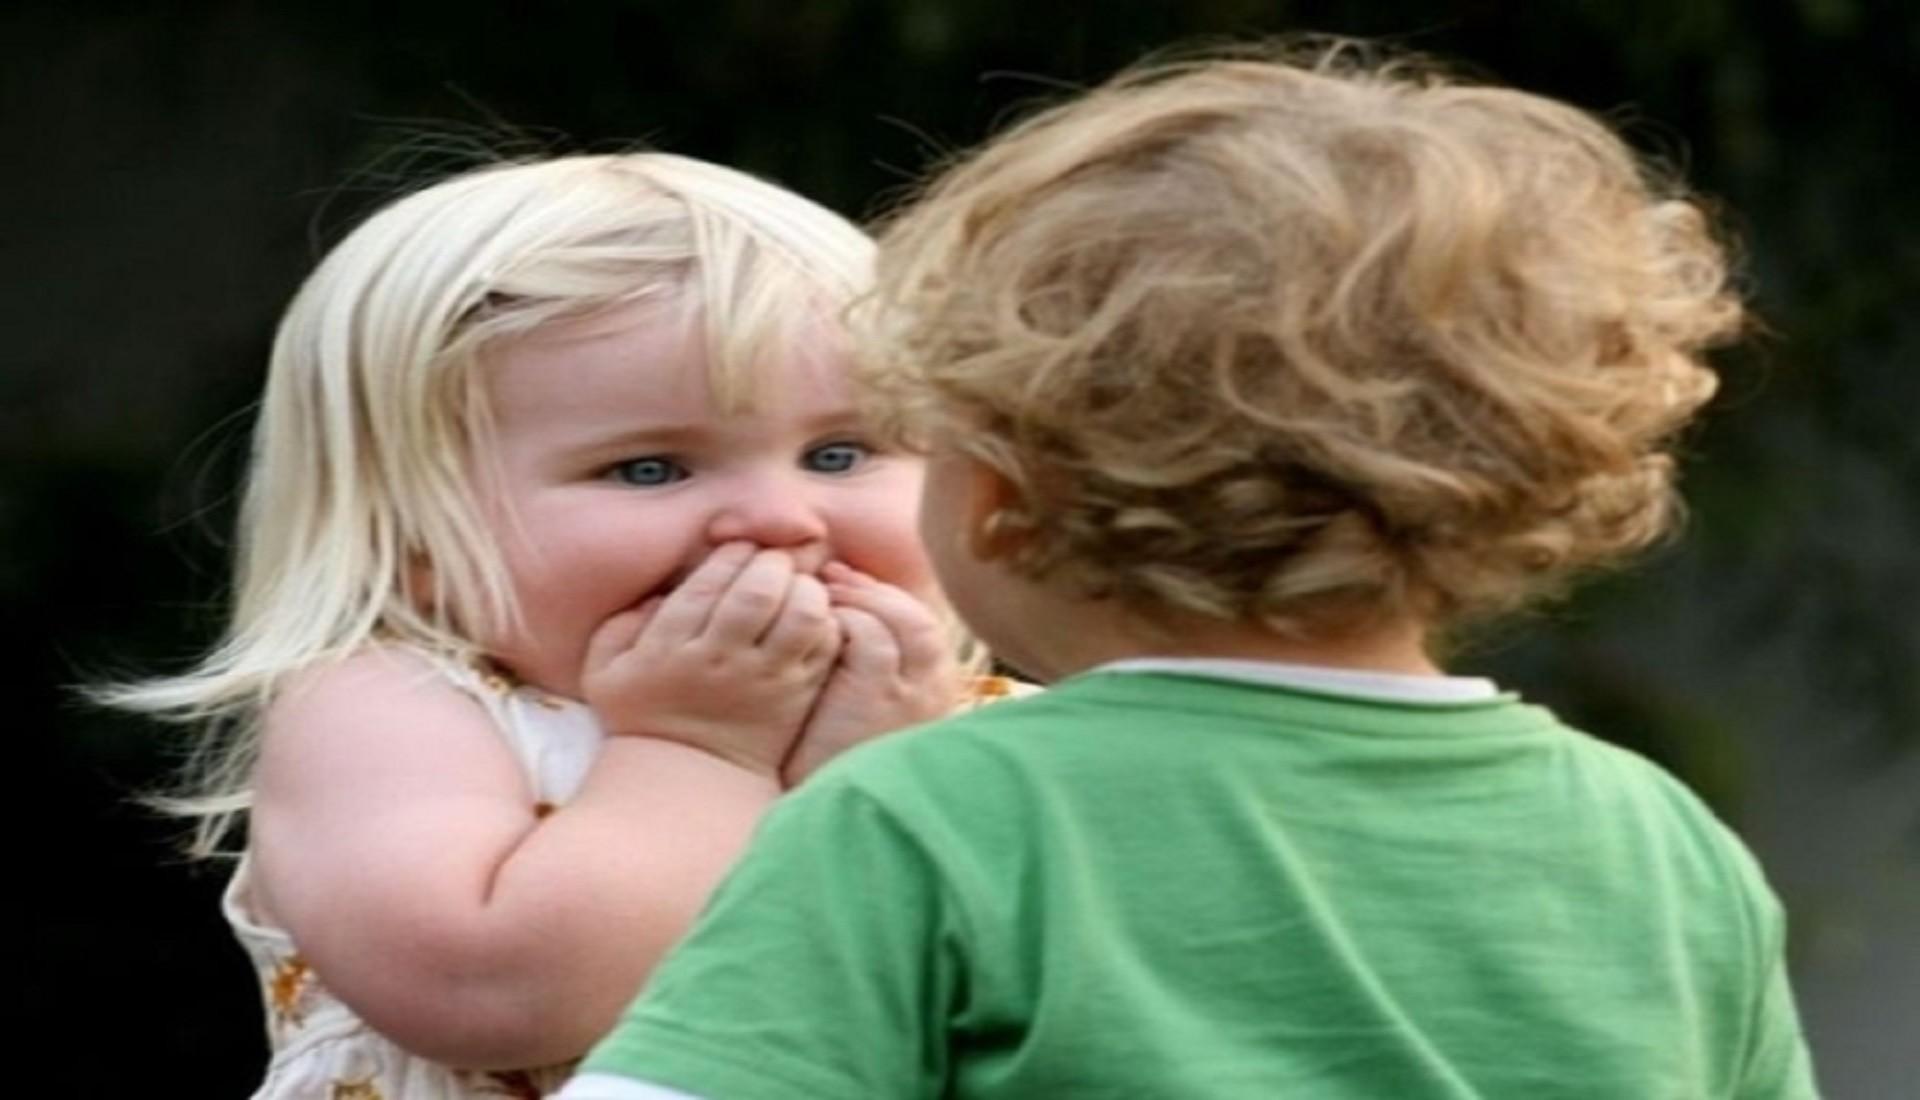 Cute Baby Boy And Girl Hd Wallpaper Free   Data Src - Cute Boy And Girl Friendship Quotes - HD Wallpaper